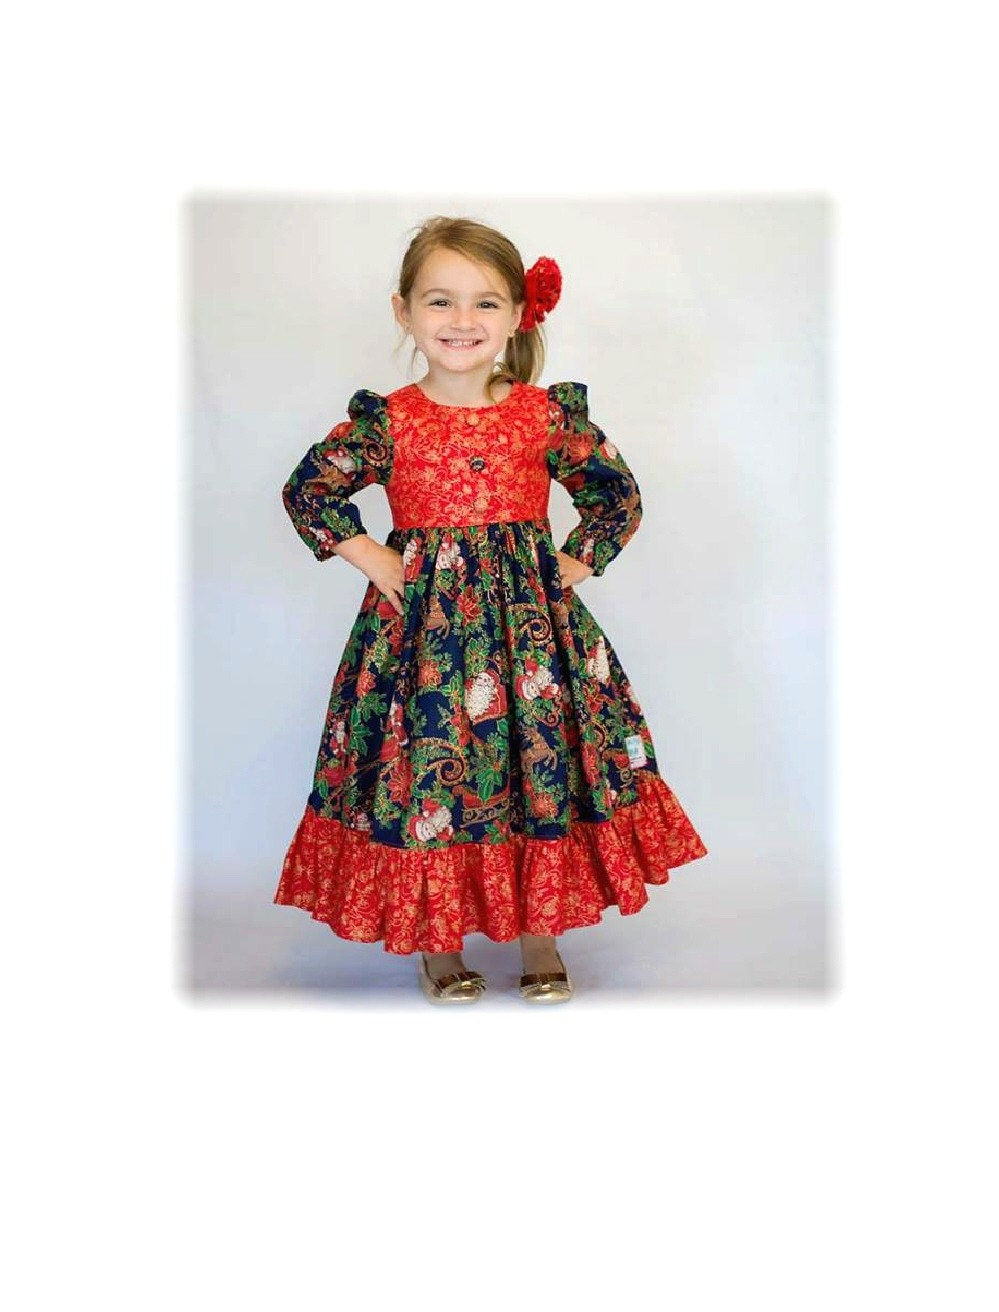 Girls Size 8 Christmas Dress hd gallery